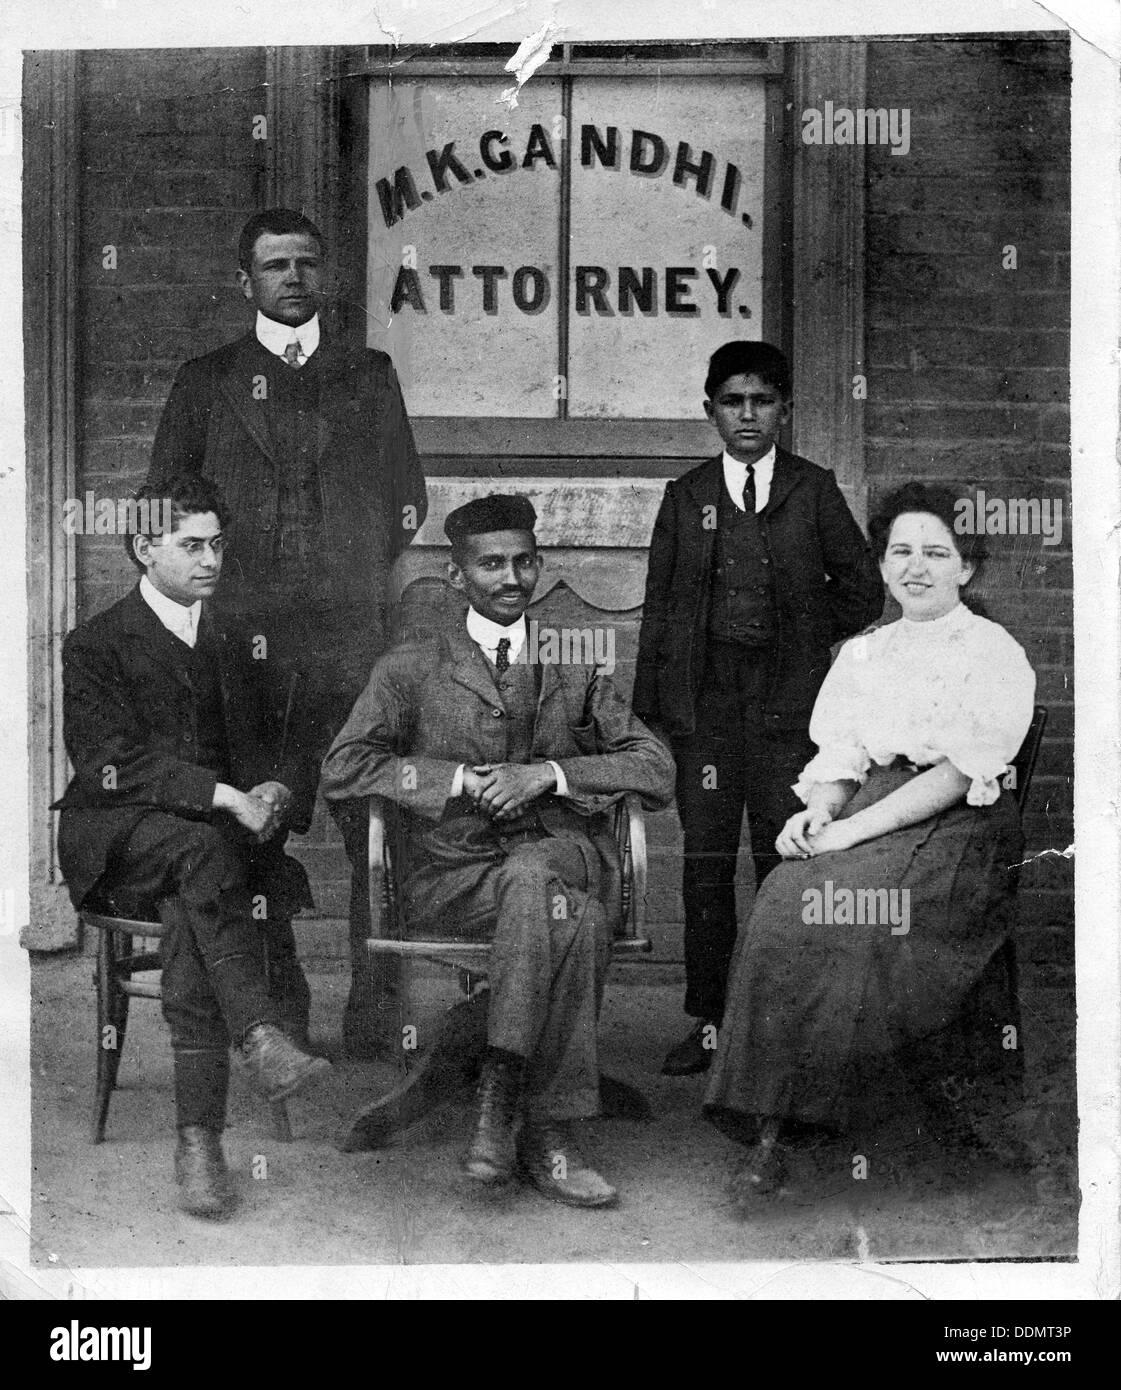 Mahatma Gandhi (1869-1948), c1900. - Stock Image